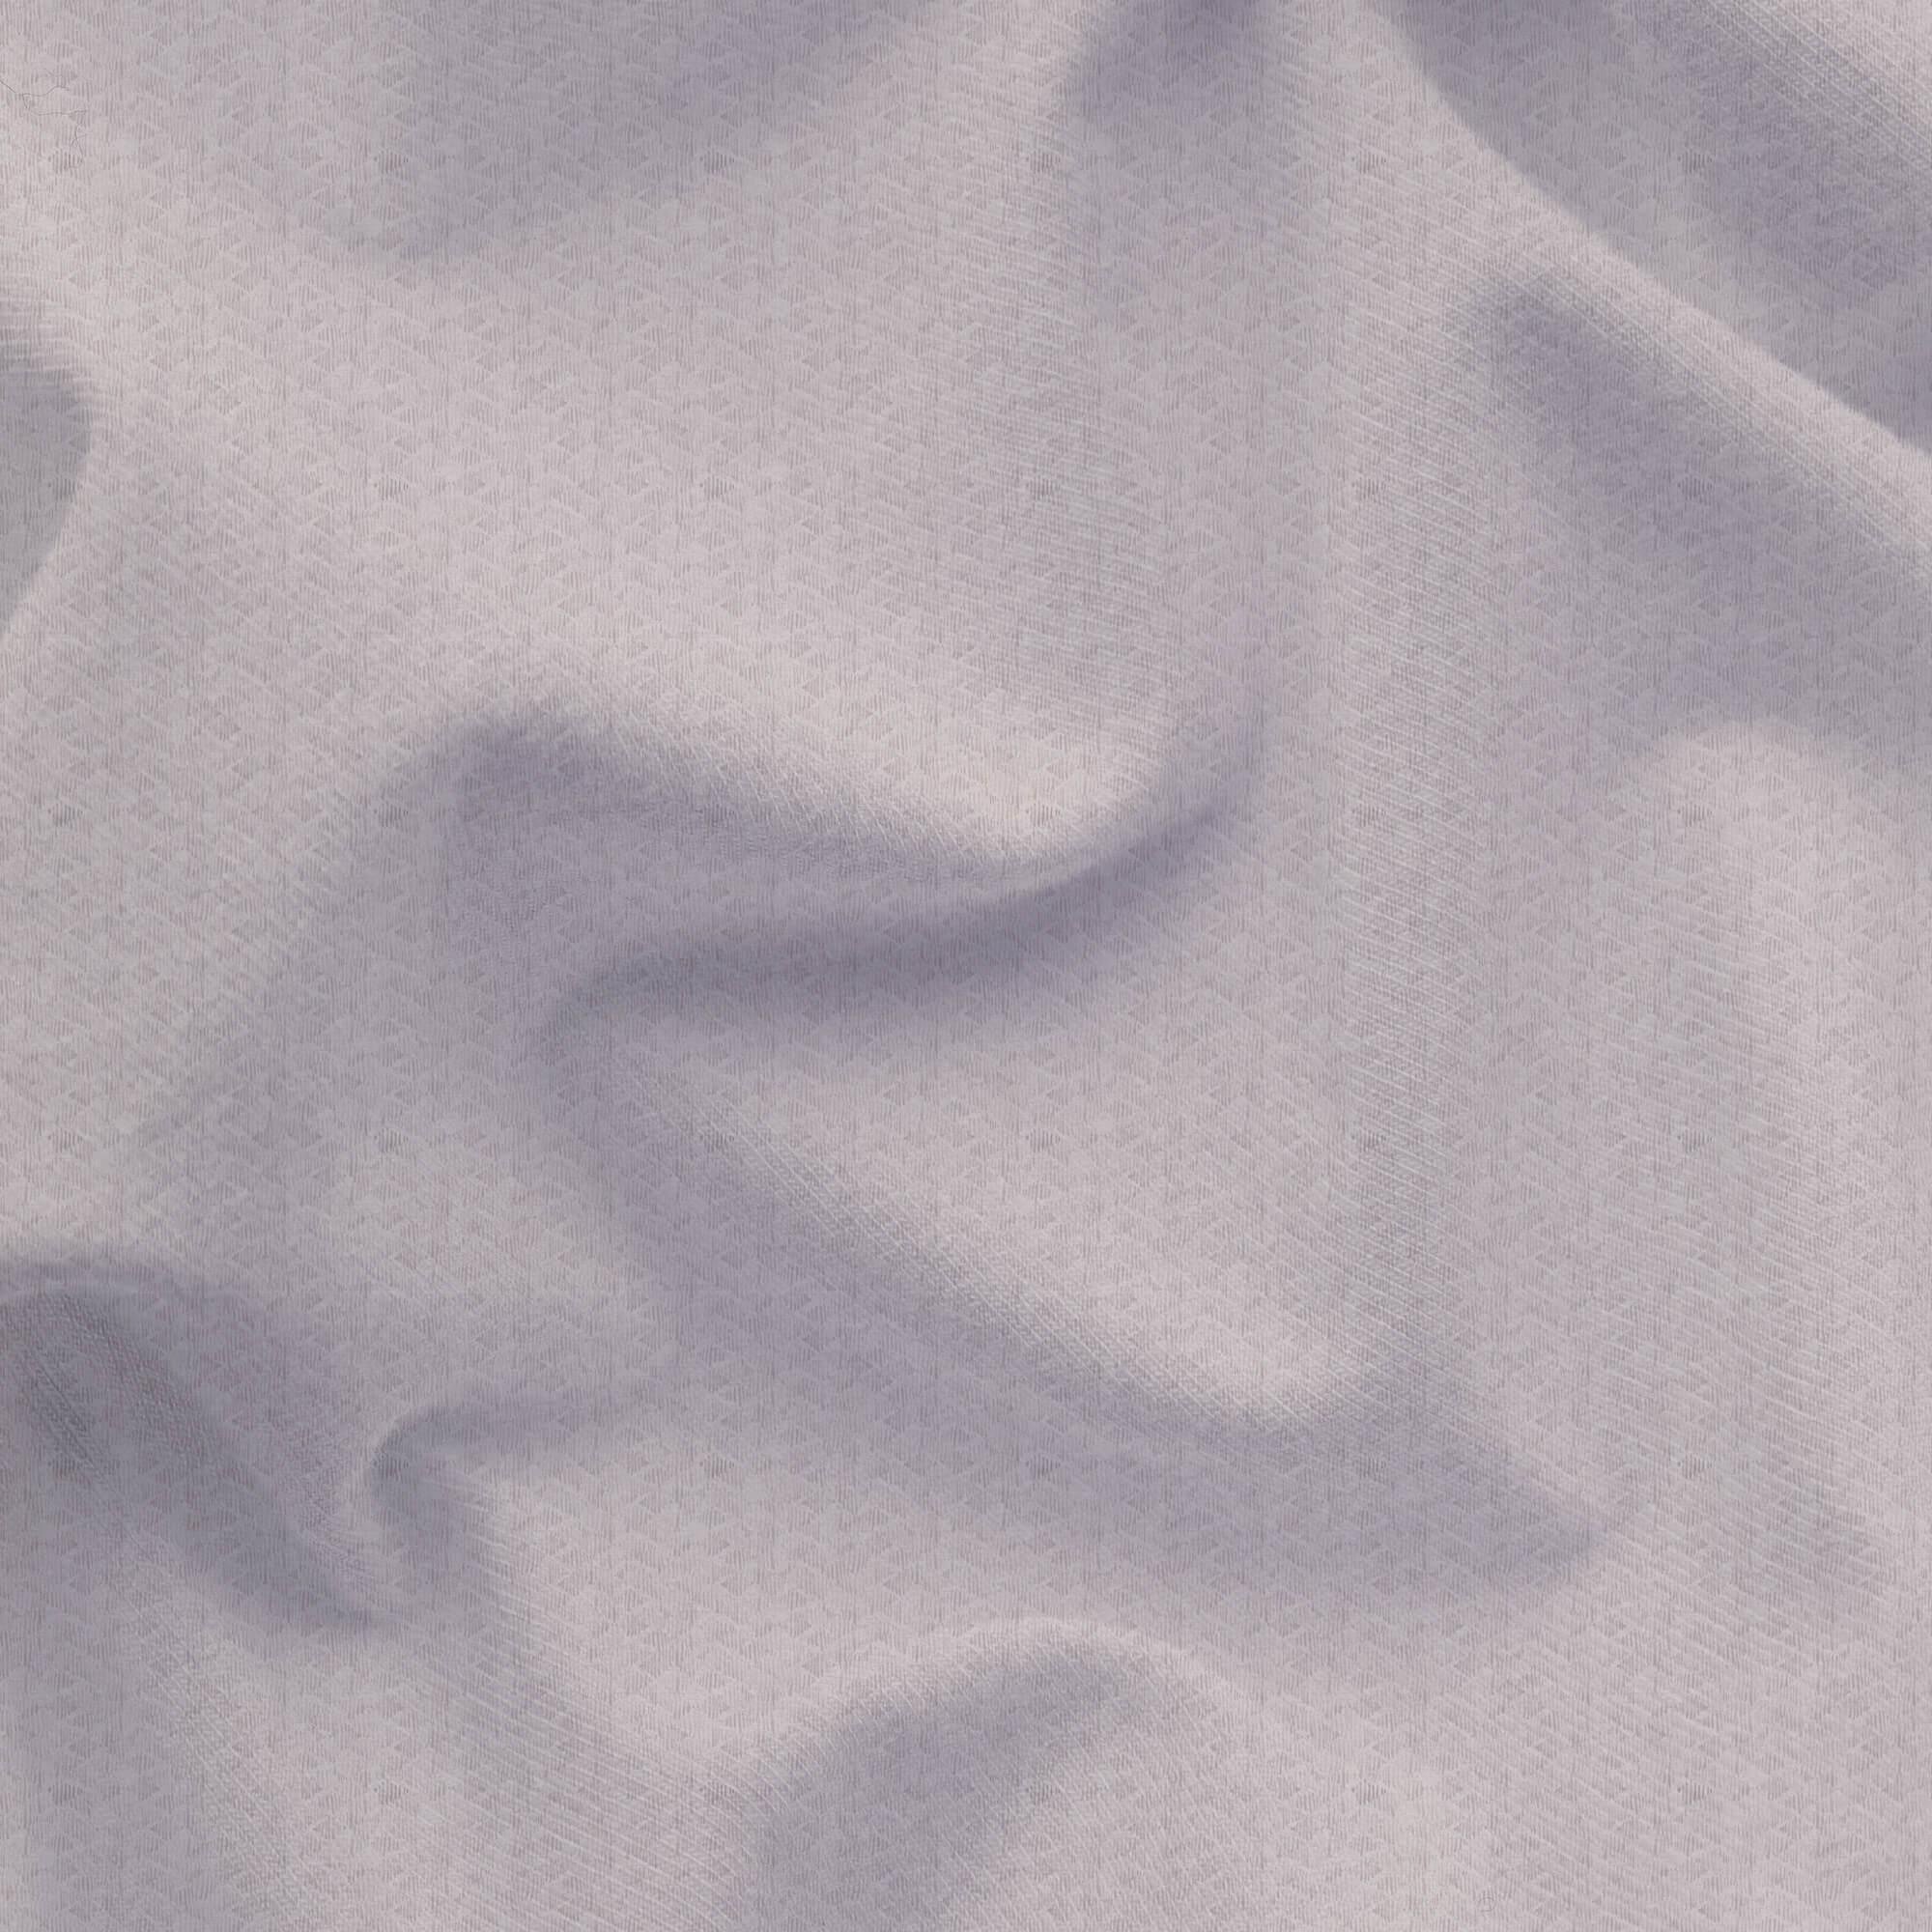 Donegal Soft-Touch-Cotton-Jersey Spannbettlaken